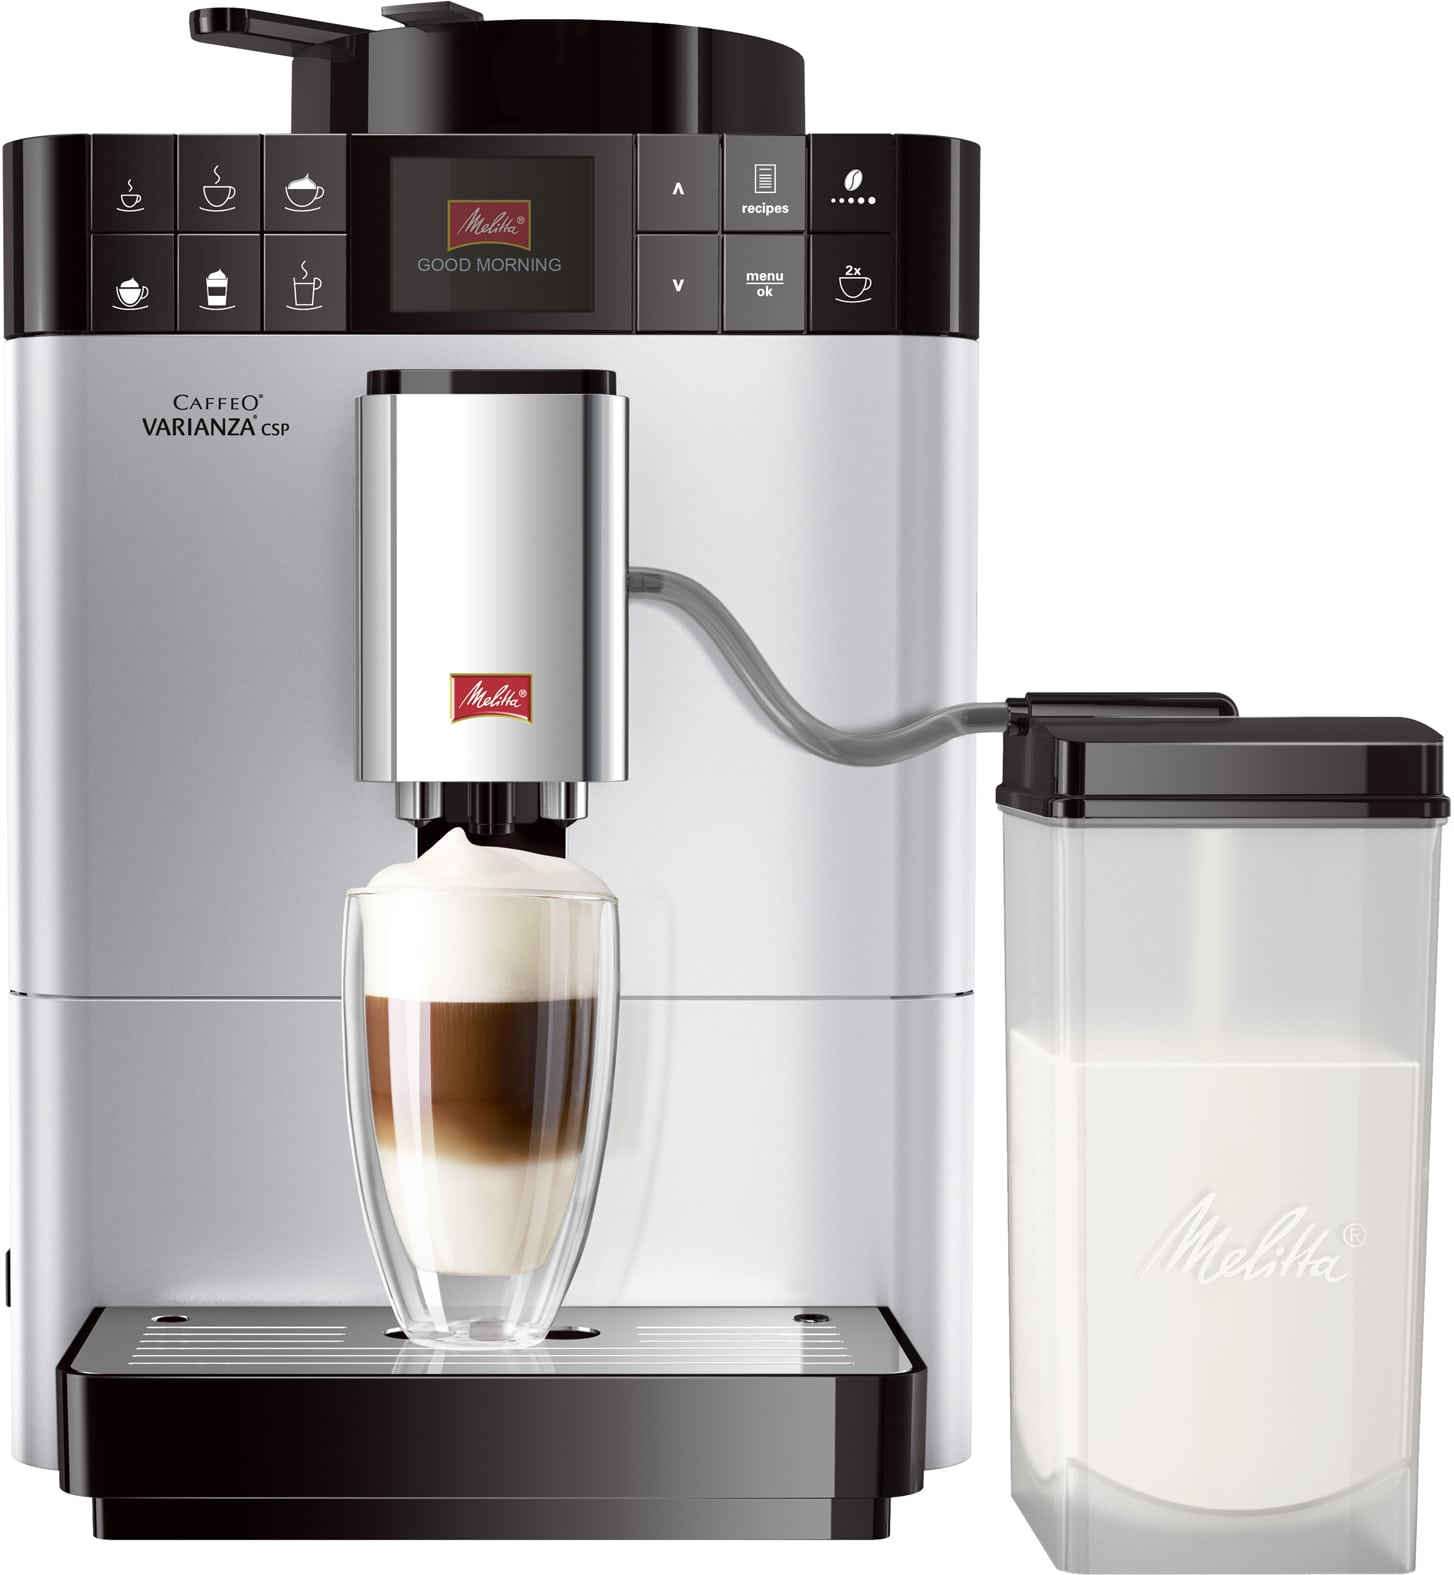 Melitta Caffeo Varianza CSP F57/0-101 Kaffeevollautomat 1,2l Milchtank für 699,00 Euro